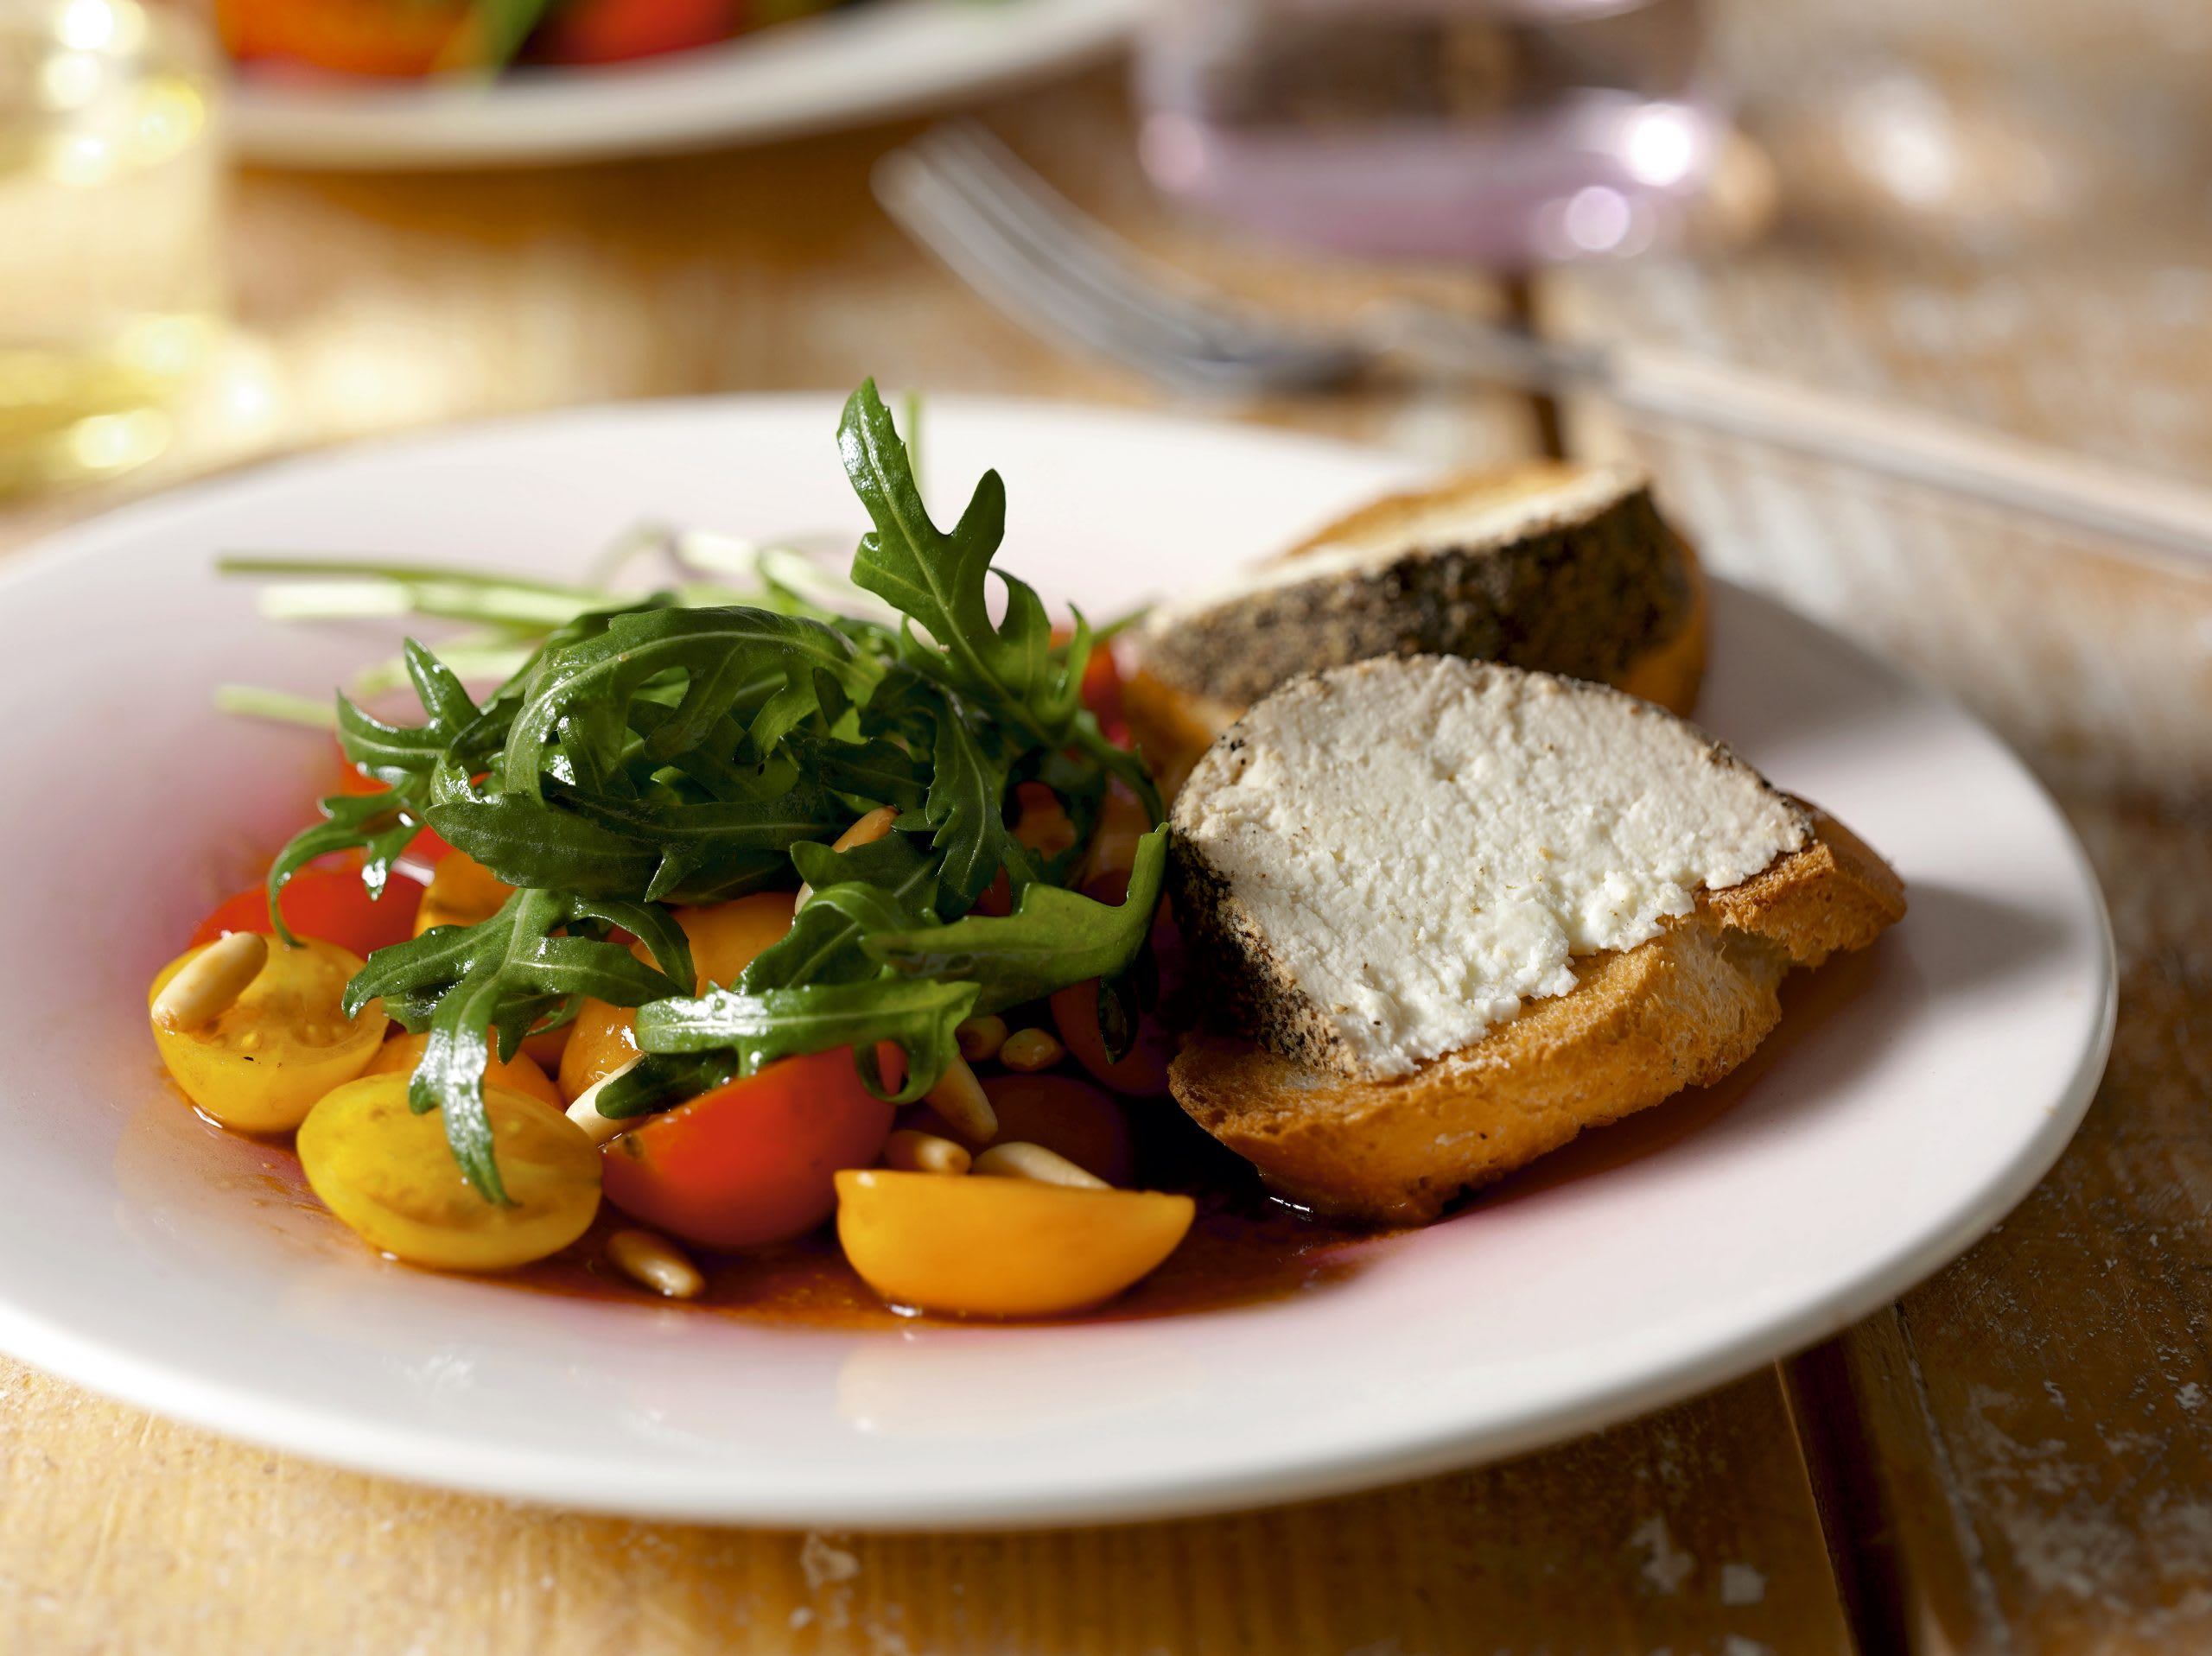 Salat und Crostini mit Belper Knolle